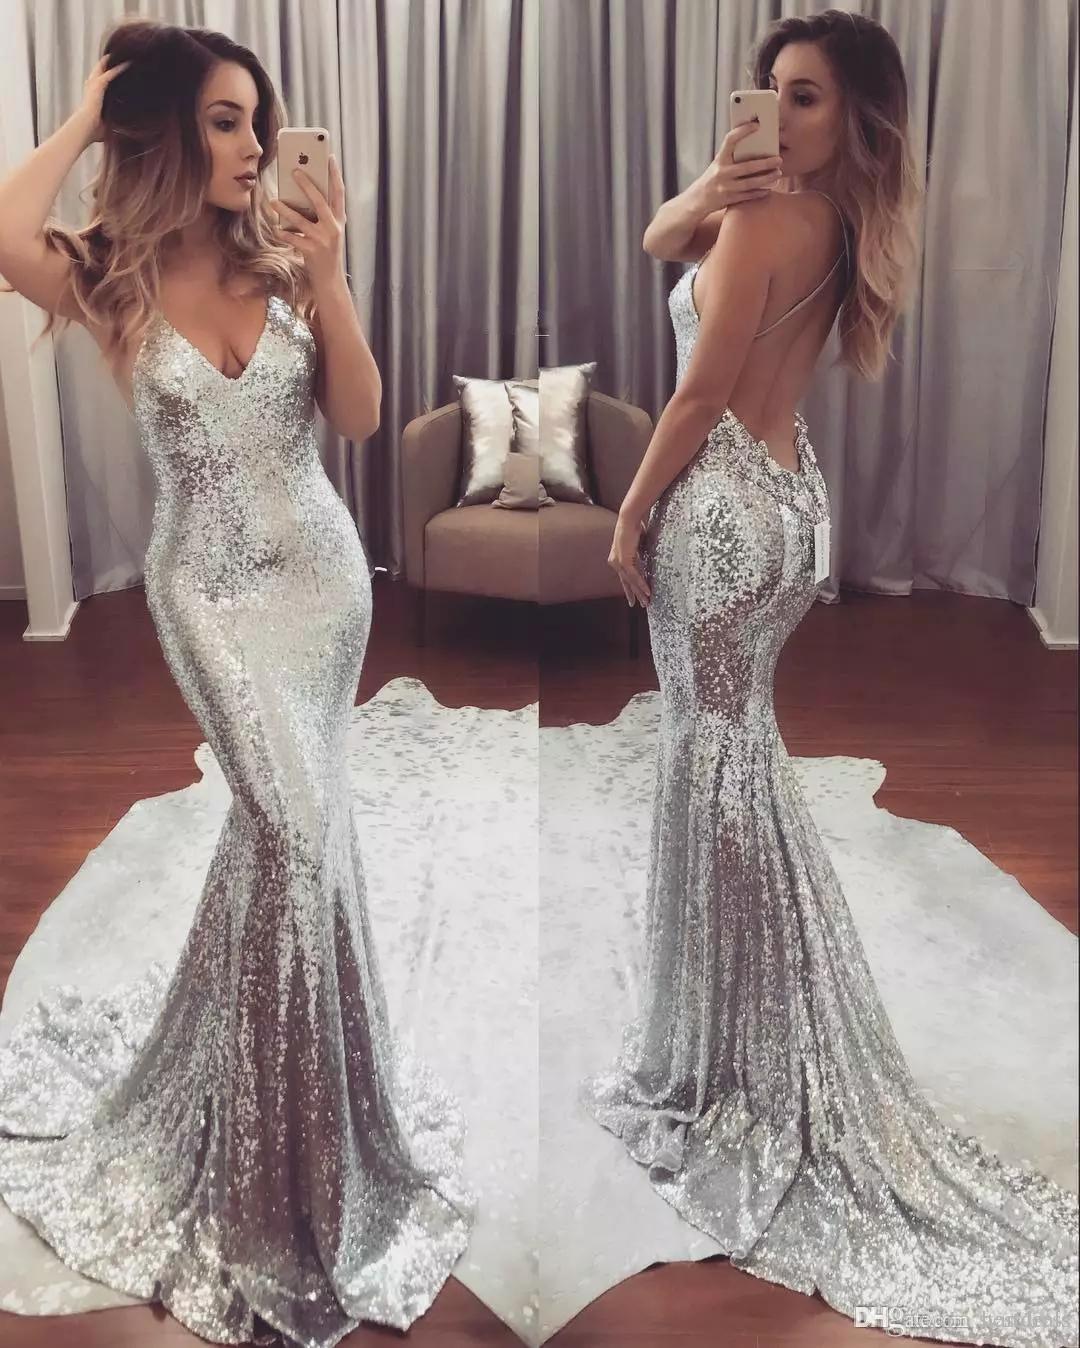 Prata Bling Lantejoulas Sereia Vestidos de Baile 2018 Chic Pescoço V Spaghetti Strap Sexy Backless Vestidos de Noite Vestidos de Festa de Férias